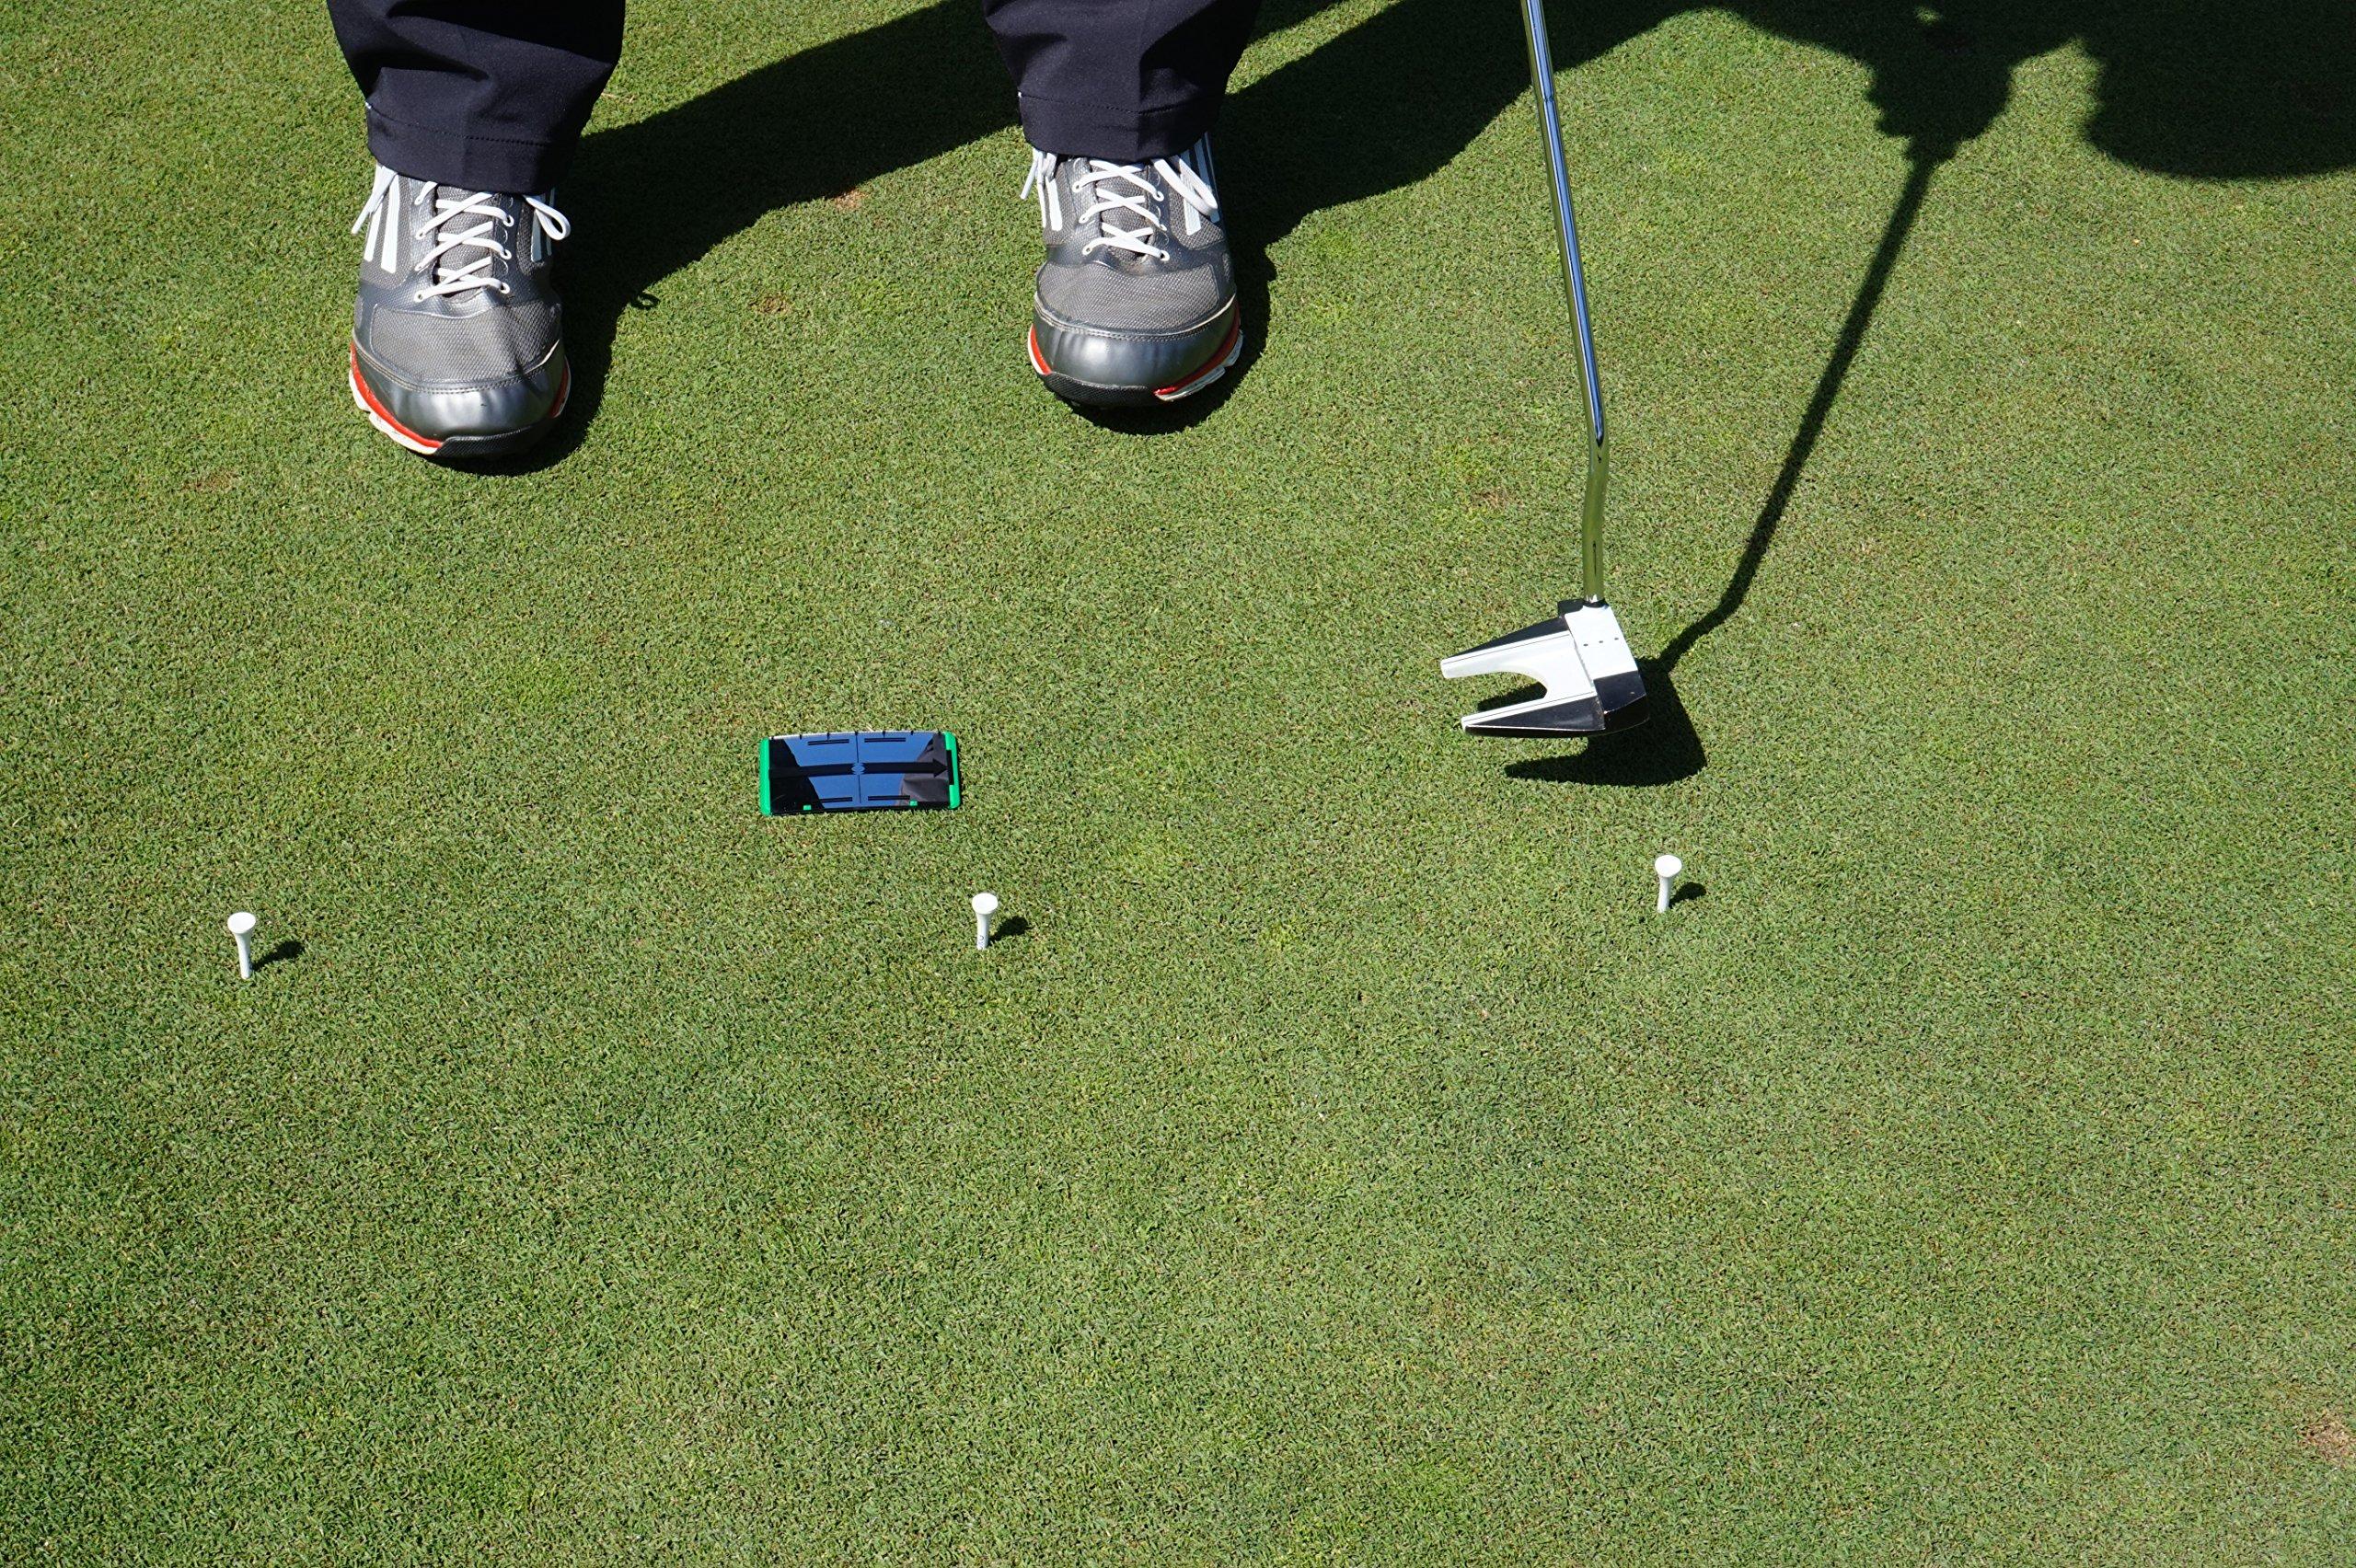 Pocket Putting Mirror Golf Alignment Training Tool